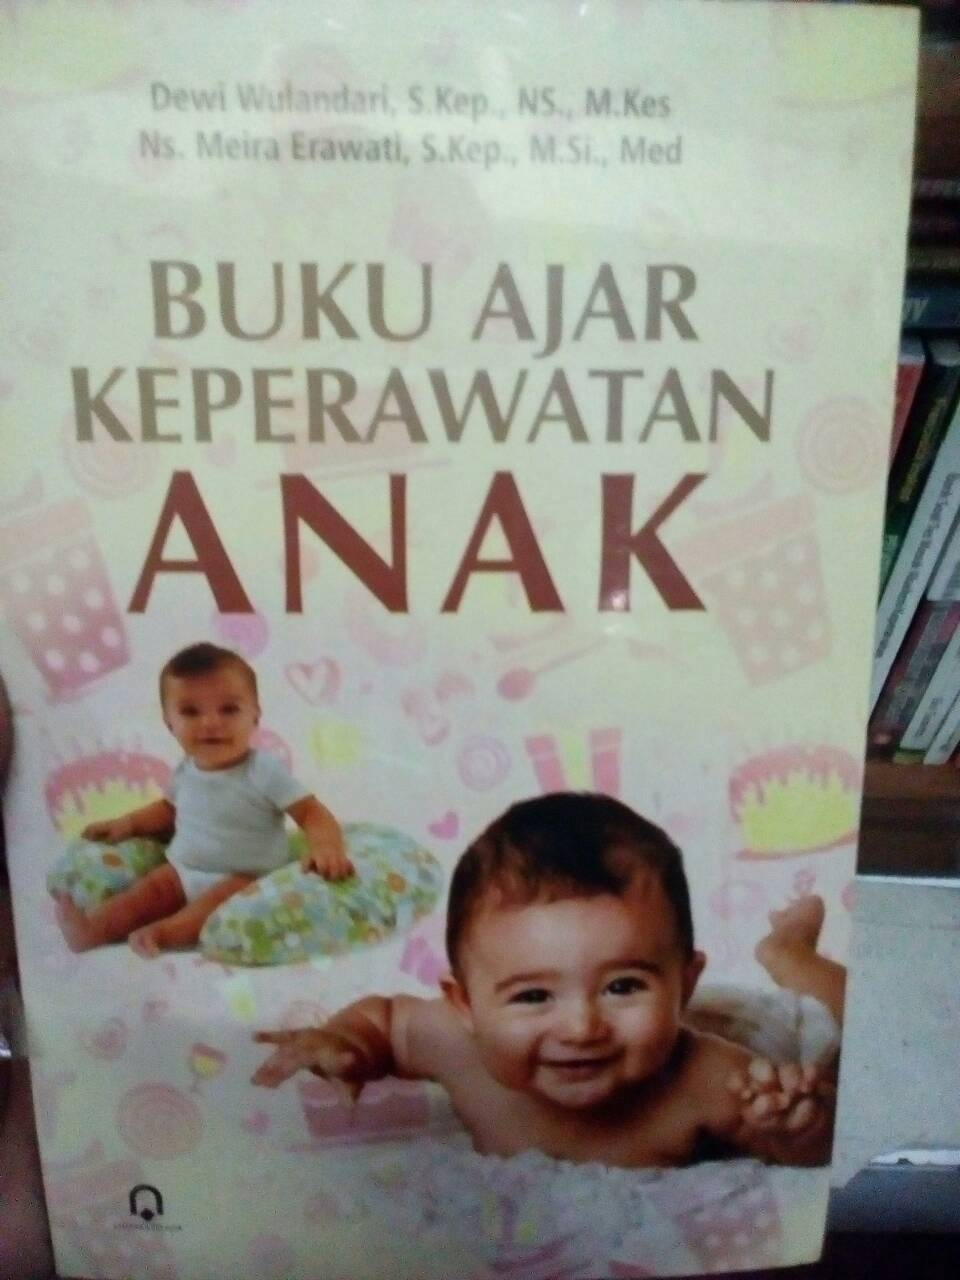 Buku Ajar Keperawatan Anak